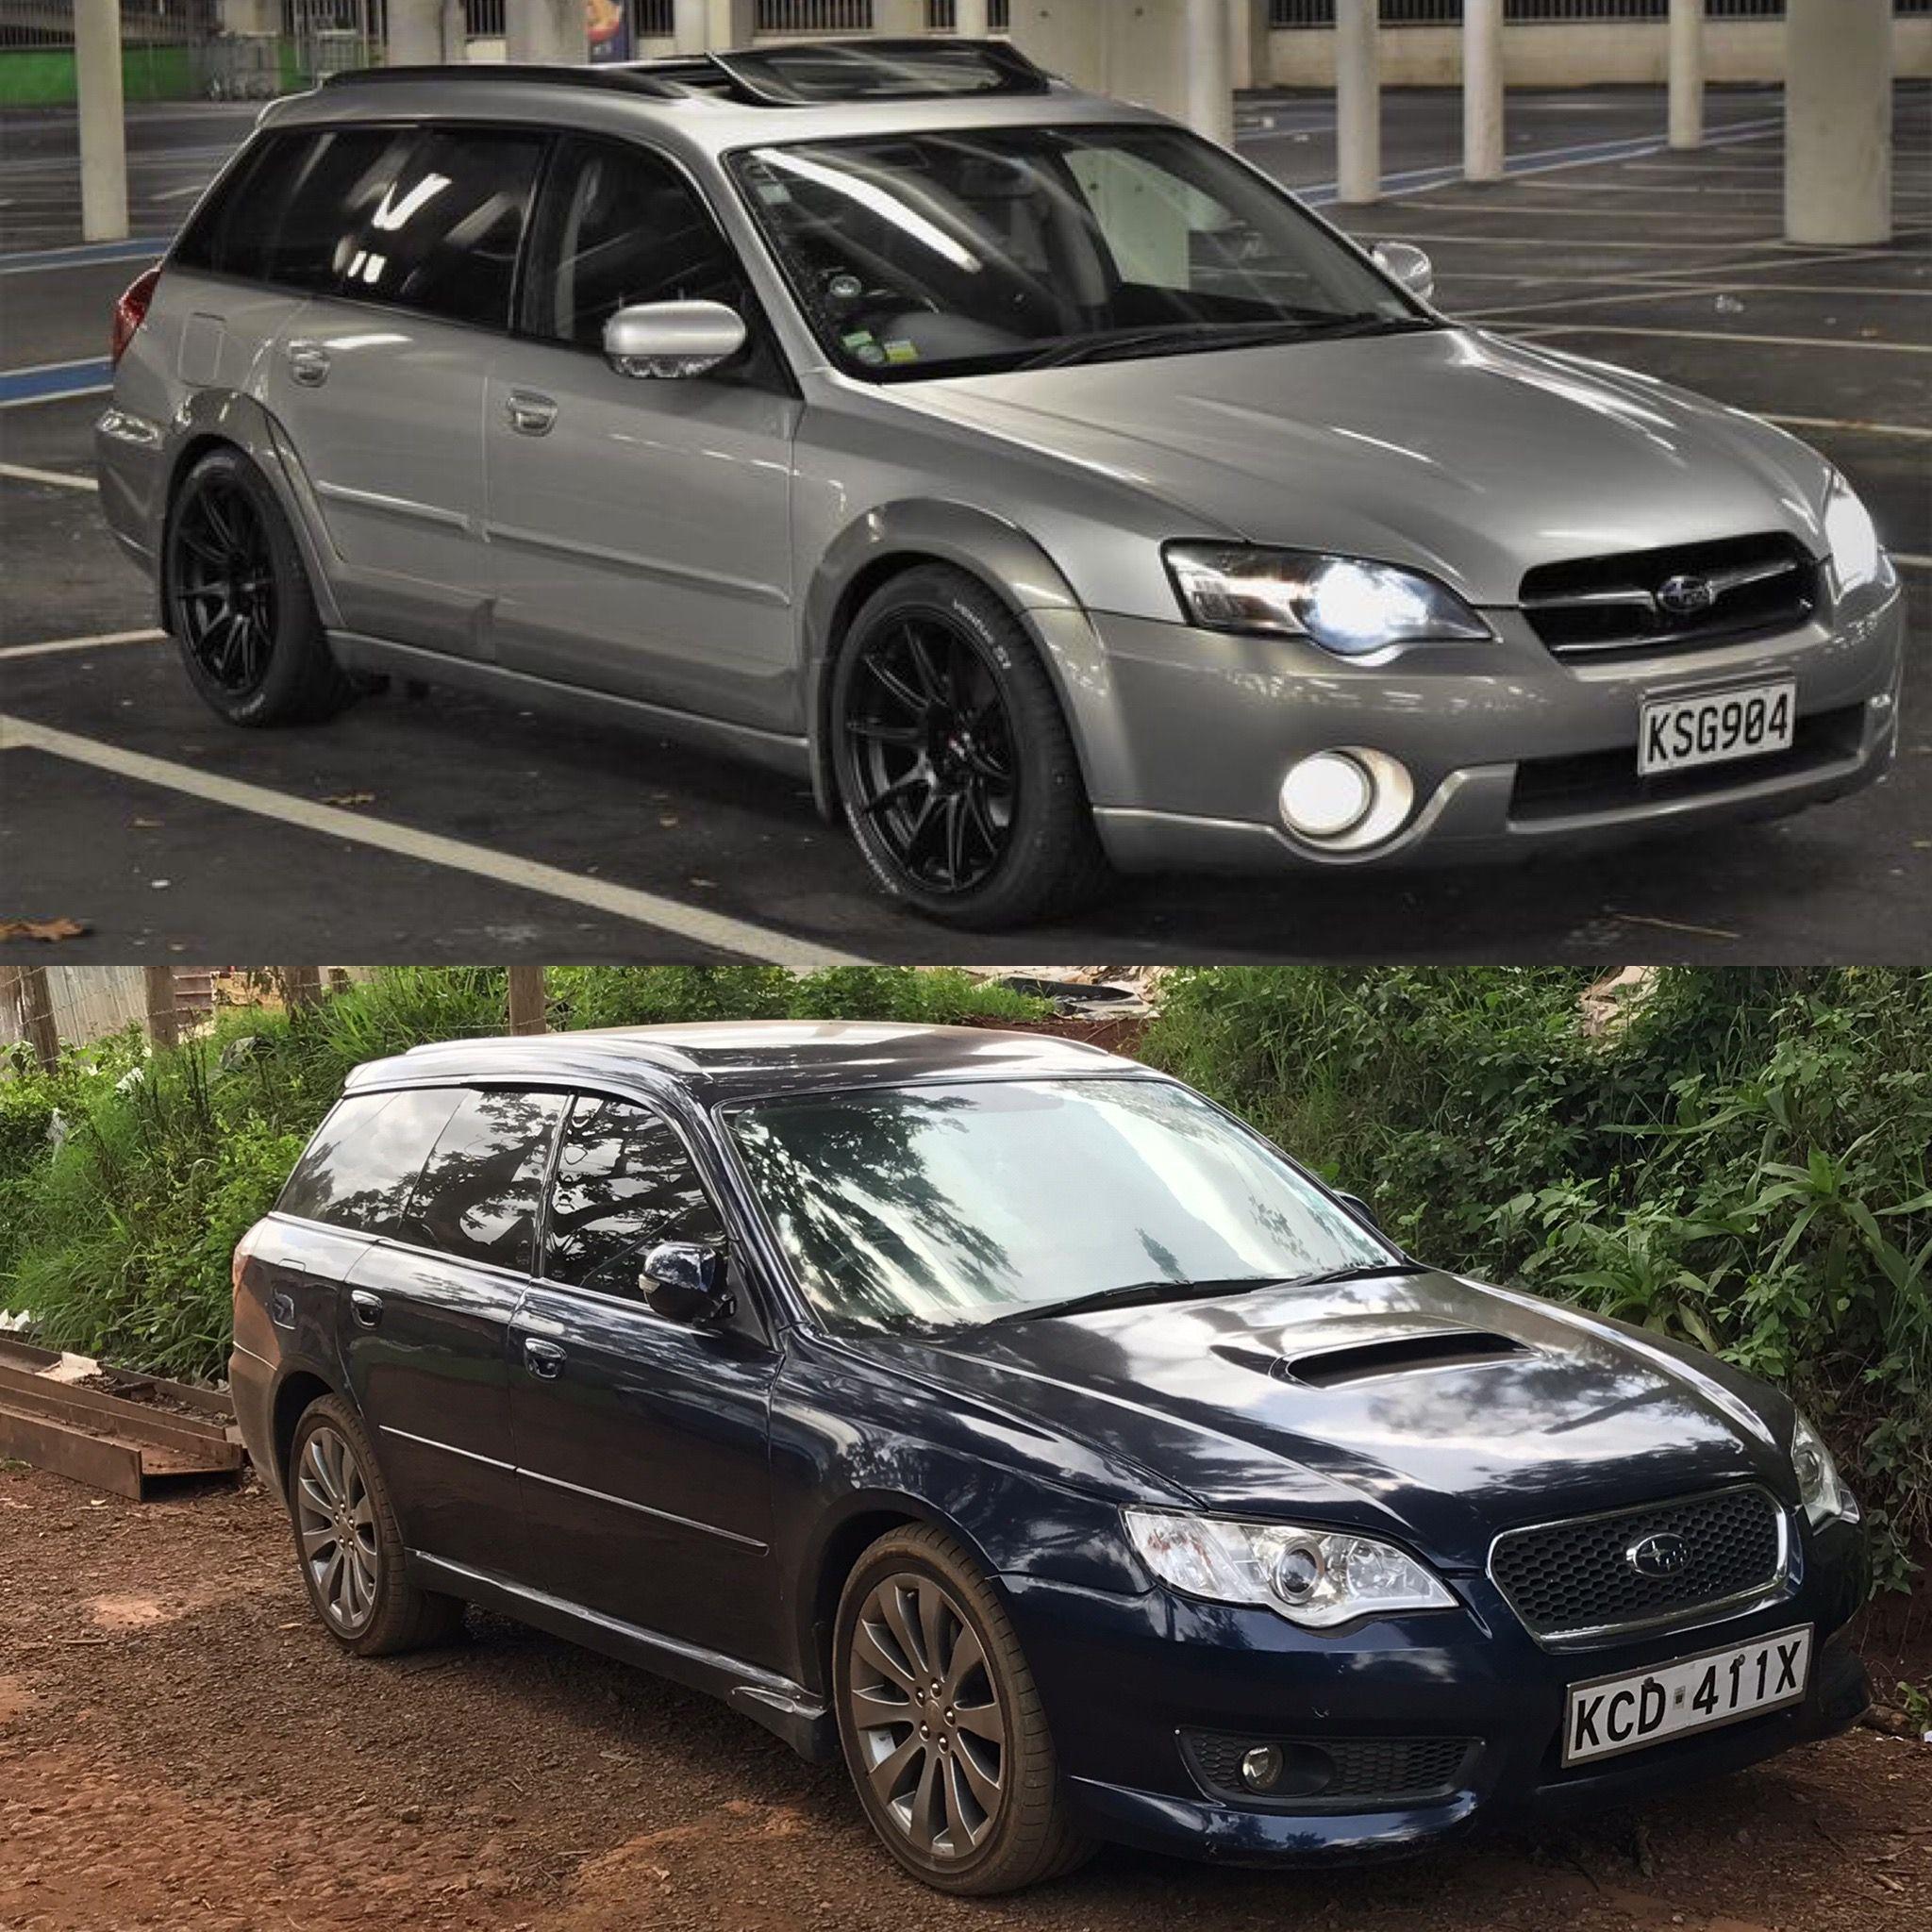 Outback Vs Spec B Gt In 2020 Car Subaru Suv Car